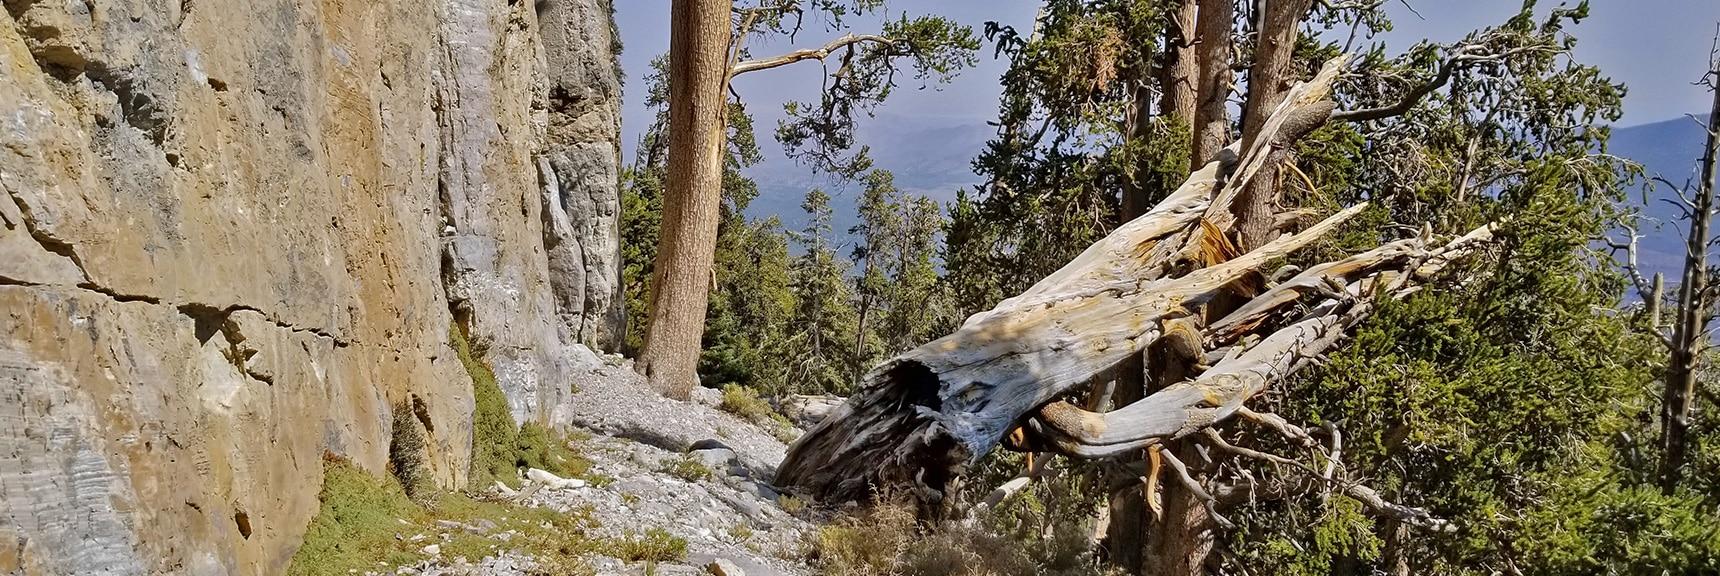 Skirting the Base of Mummy Mt. Head Cliff   Mummy Mountain's Head, Mt Charleston Wilderness, Spring Mountains, Nevada 027